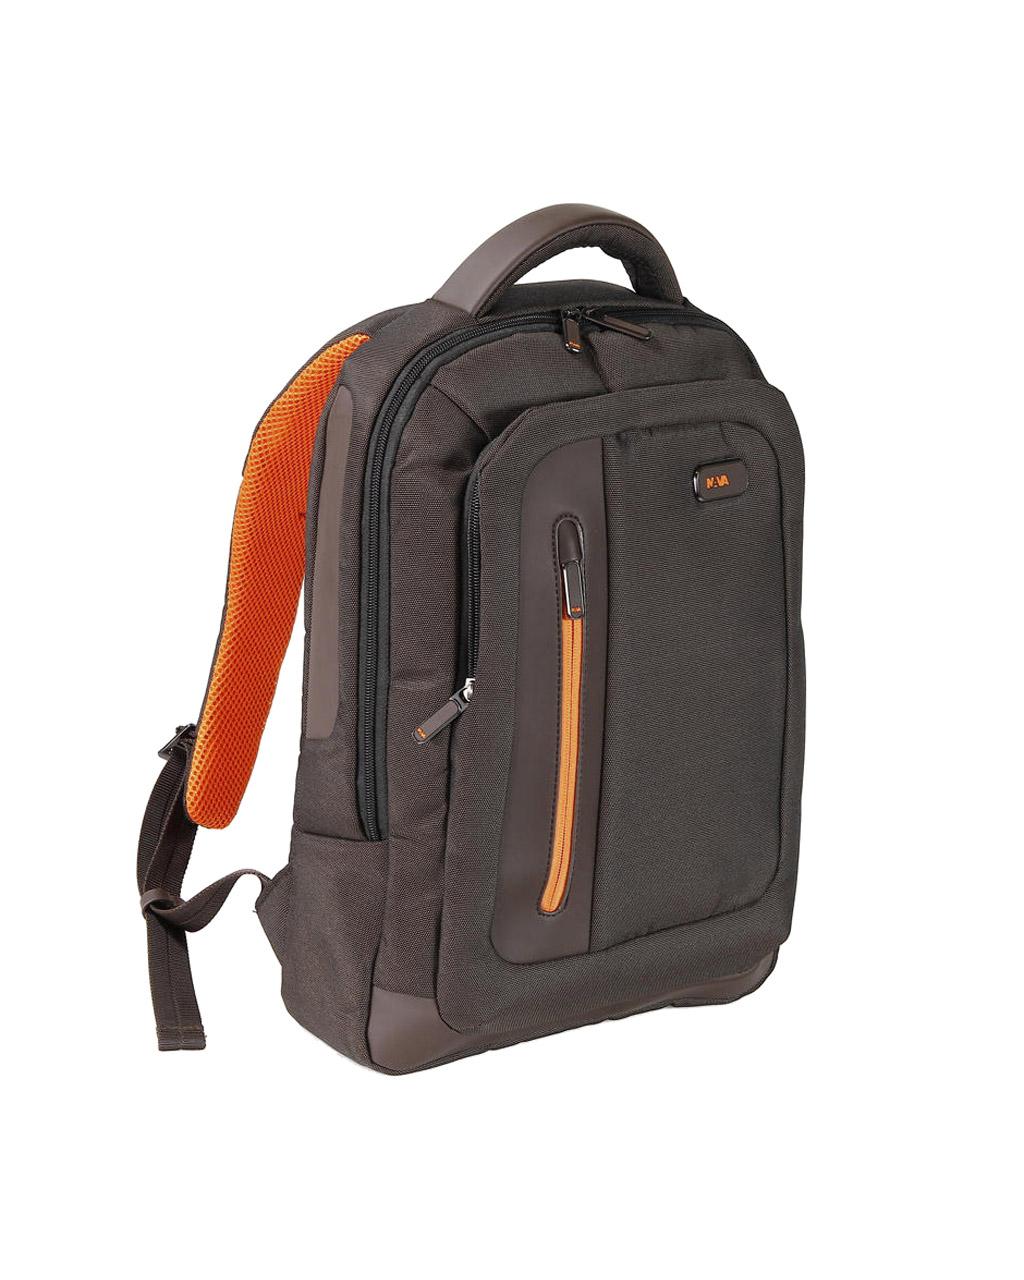 Nava Τσάντα Laptop & i Pad Dot_ Com DC070A   δωρα δερμάτινα είδη   αξεσουάρ